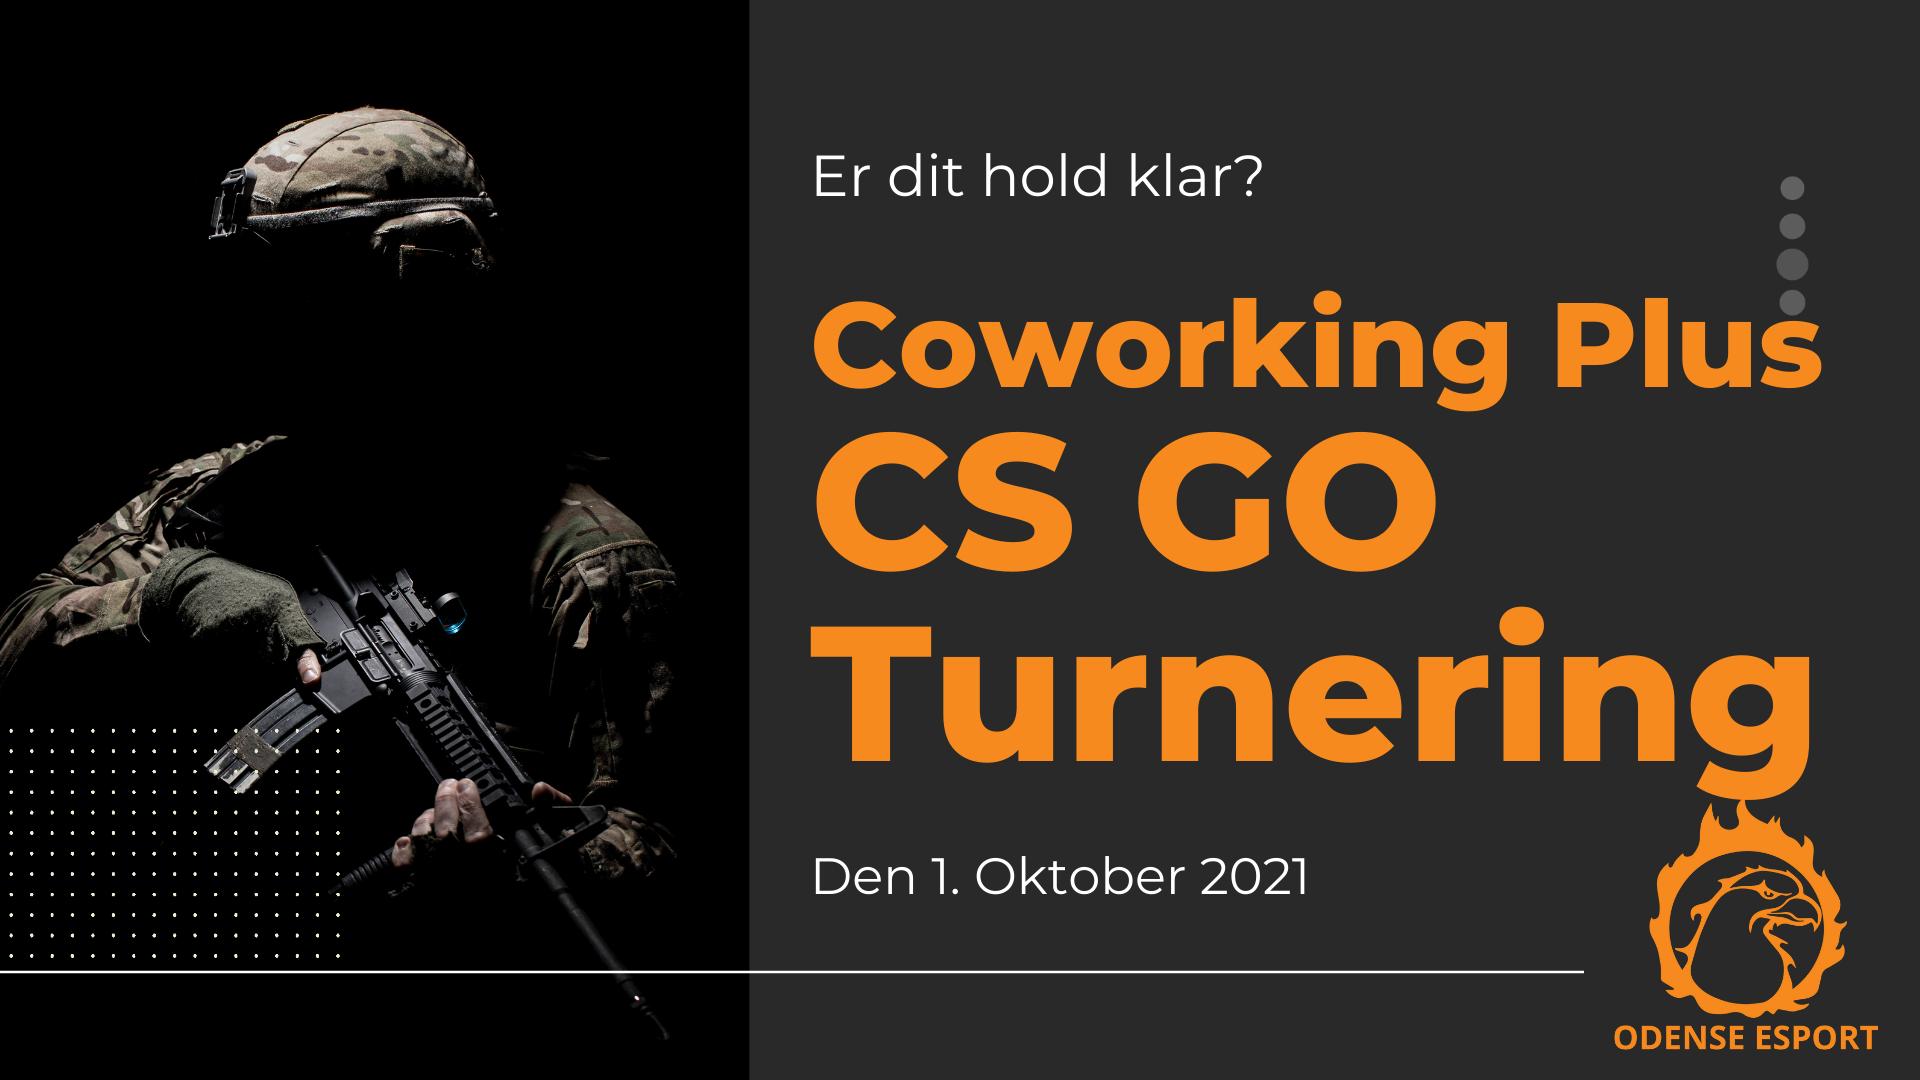 Coworking Plus CS:GO Turnering